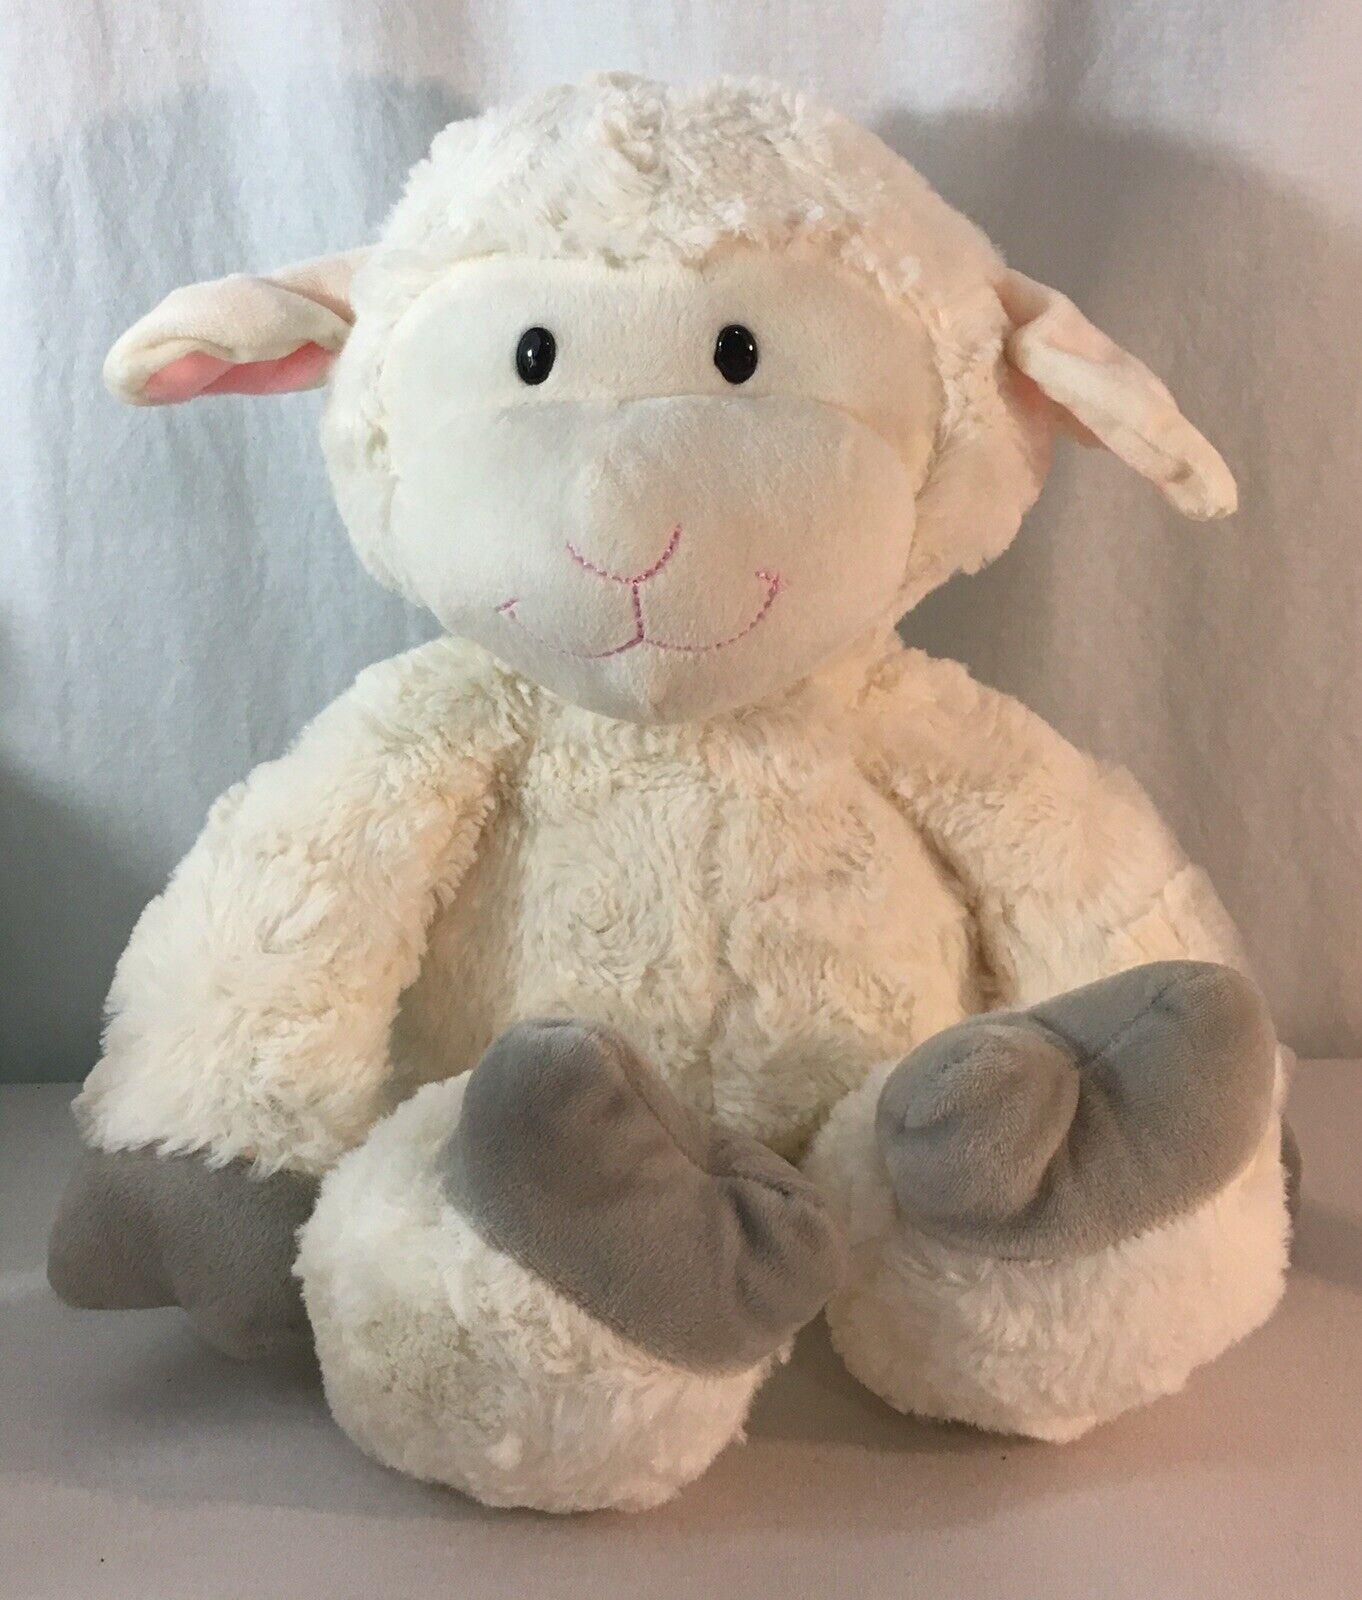 Animal Adventure 2018 Plush White Sheep Lamb Easter Stuffed Animal